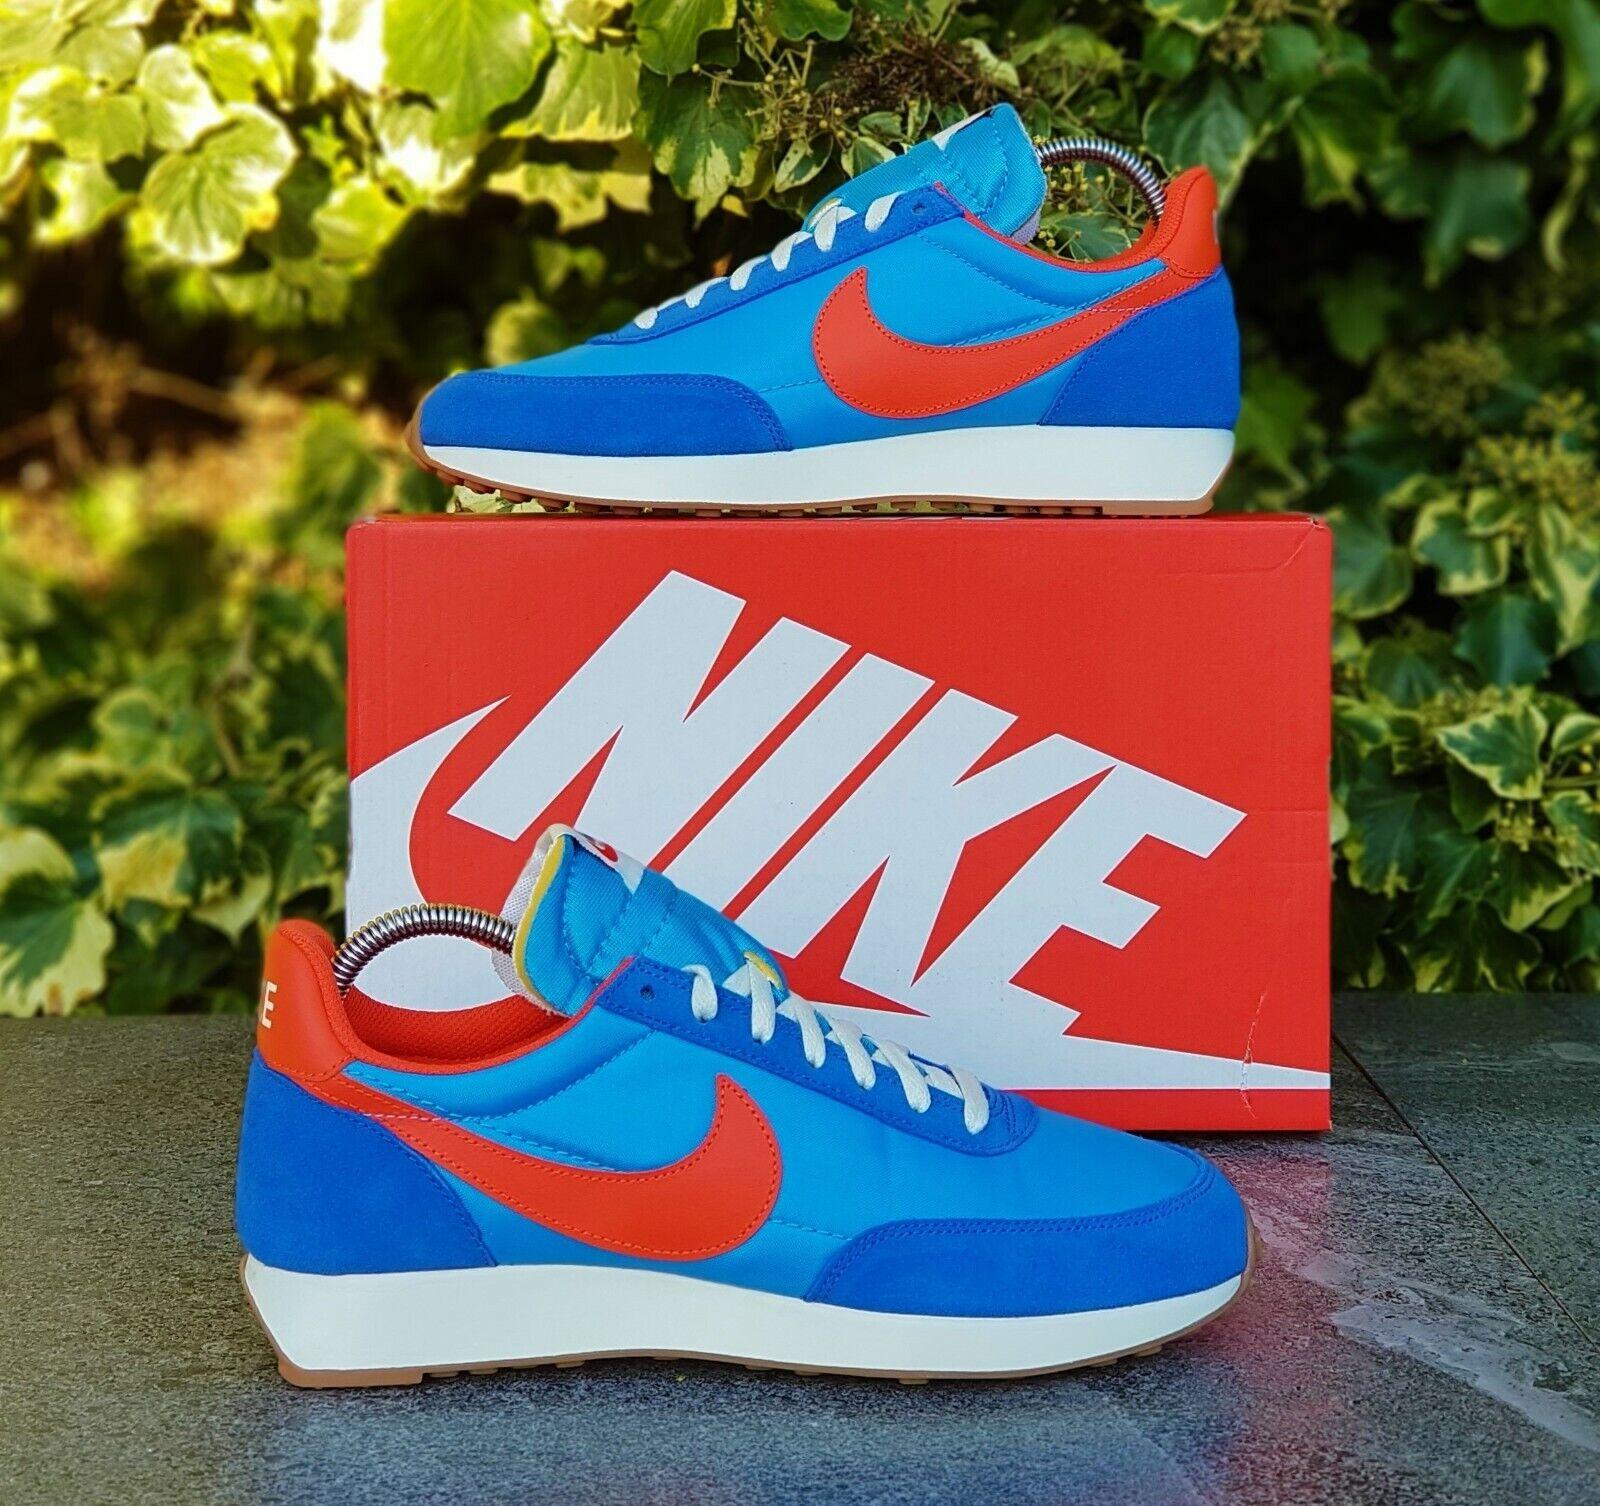 BNWB & Genuine Nike ® Air Tailwind 79 Vintage Retro Blau Trainers UK Größe 7